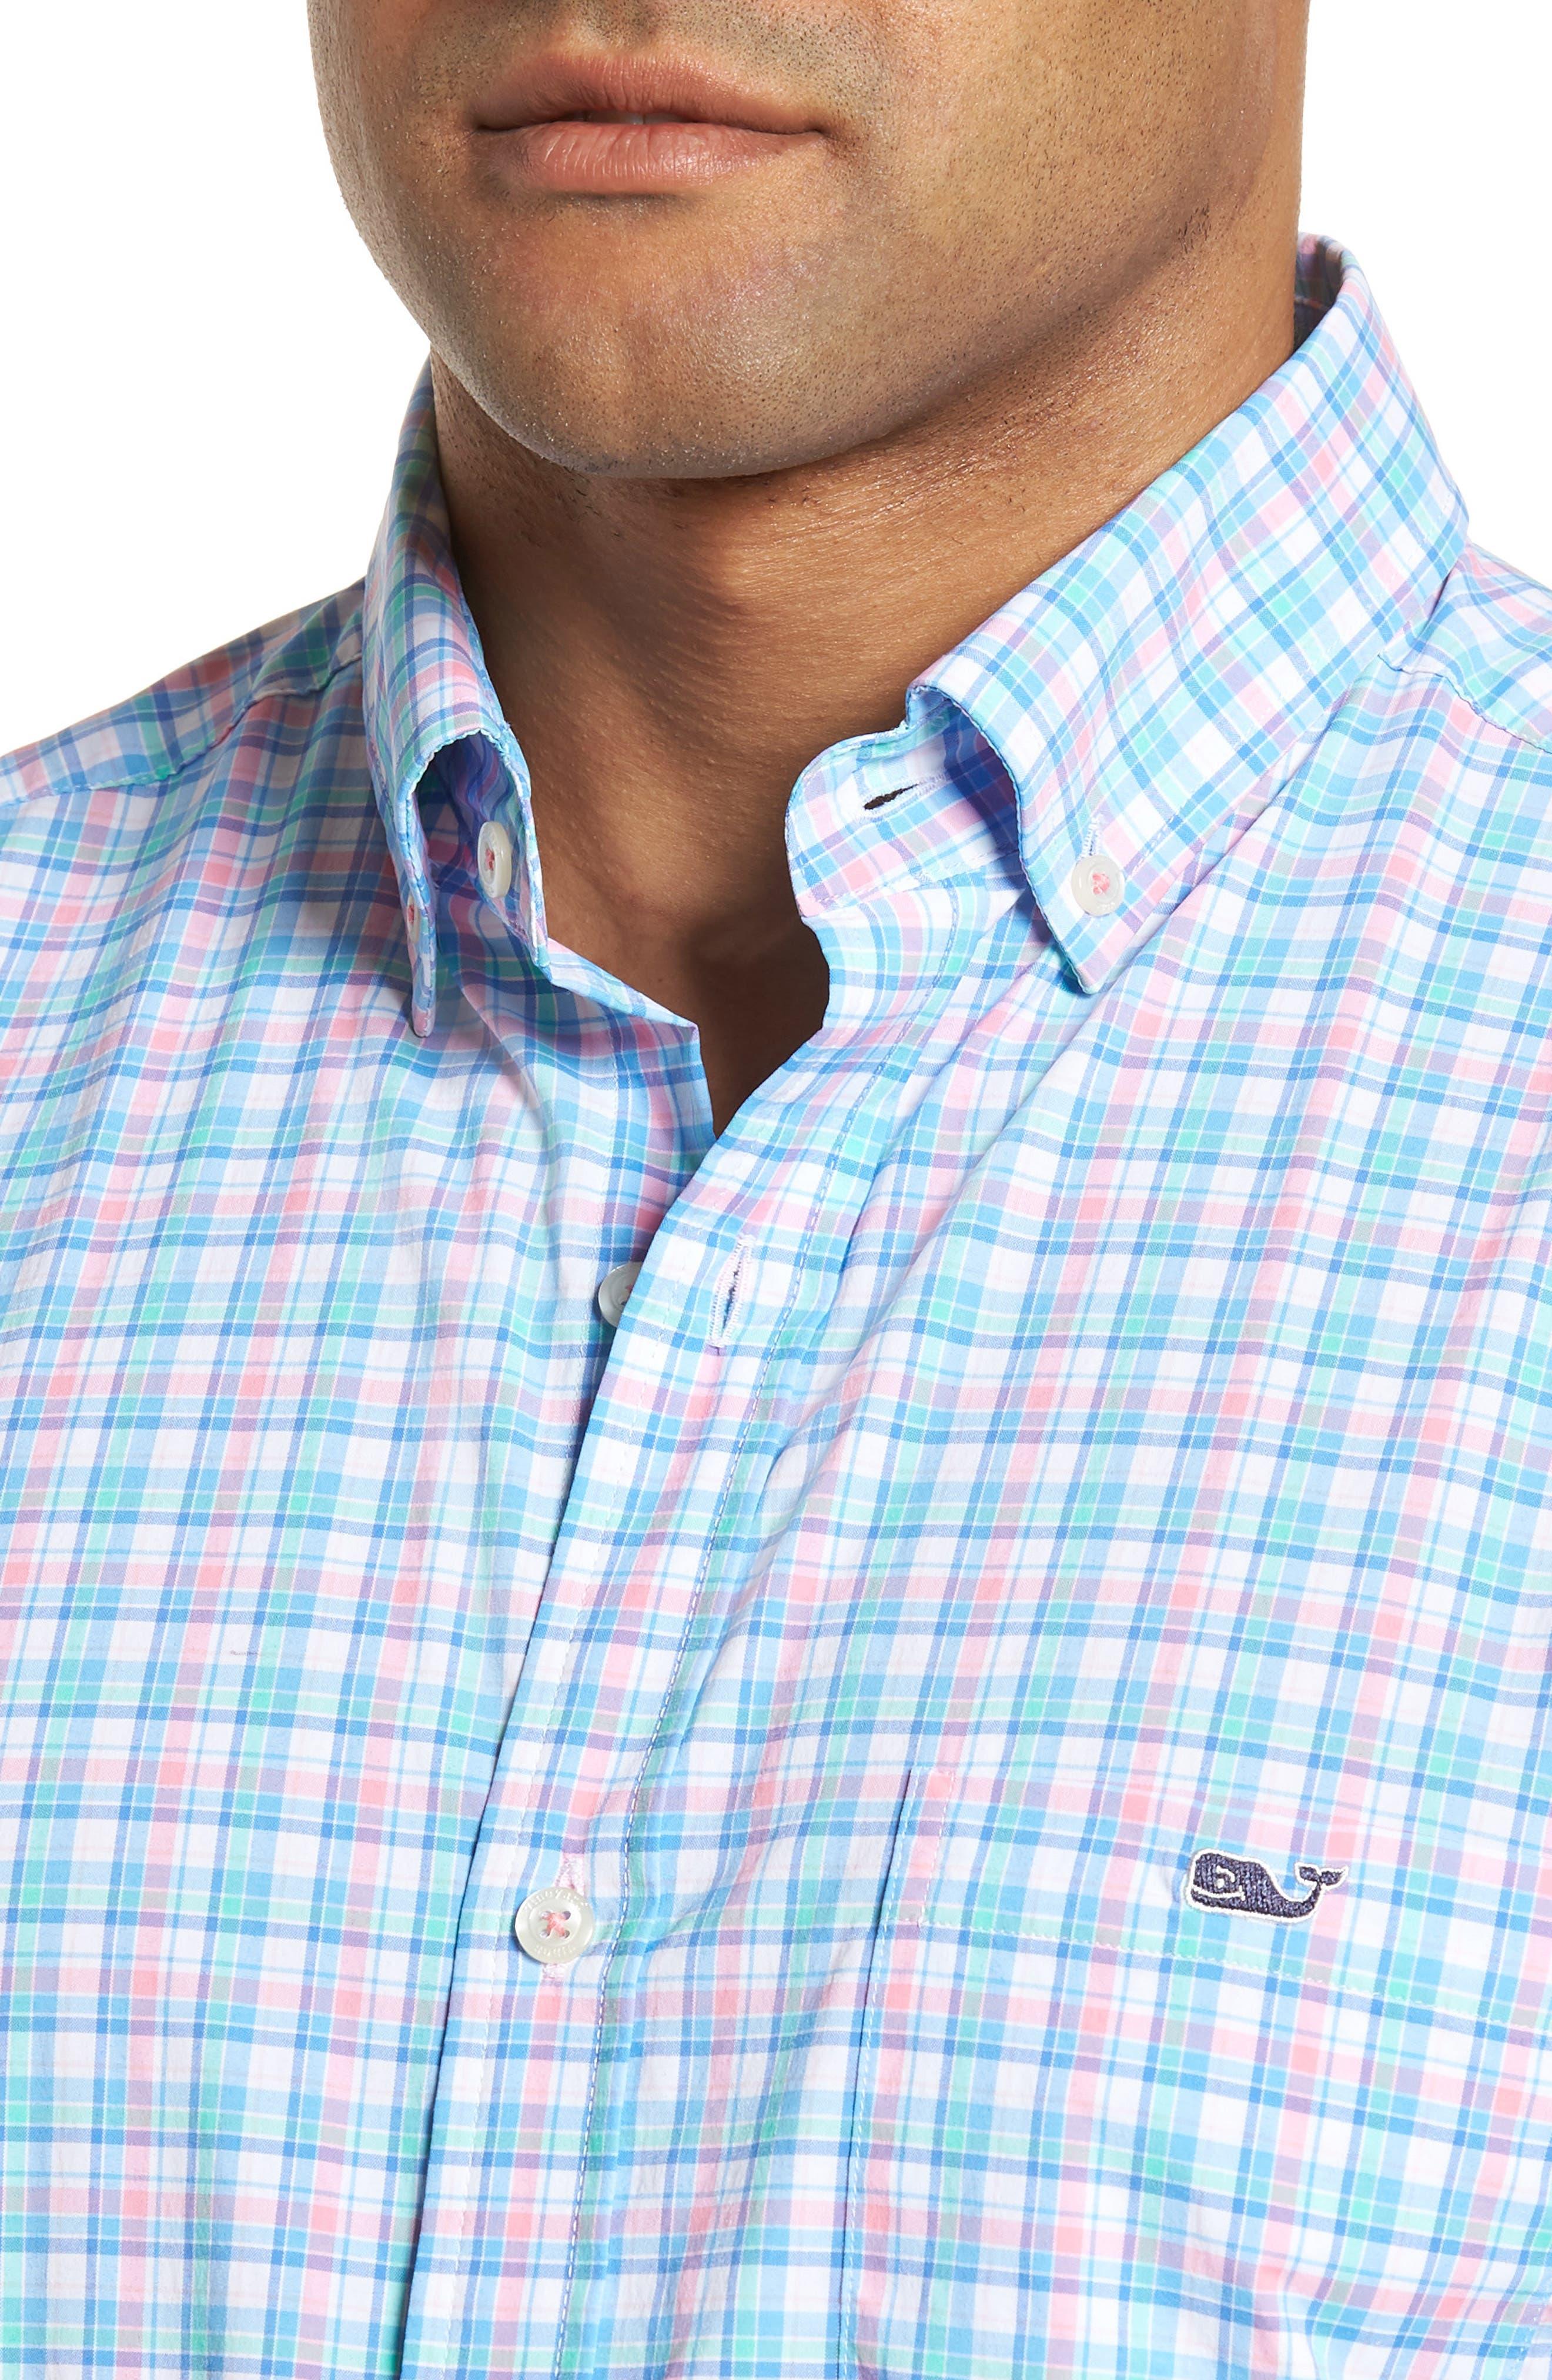 Tiki Bar Plaid Classic Fit Sport Shirt,                             Alternate thumbnail 4, color,                             Pink